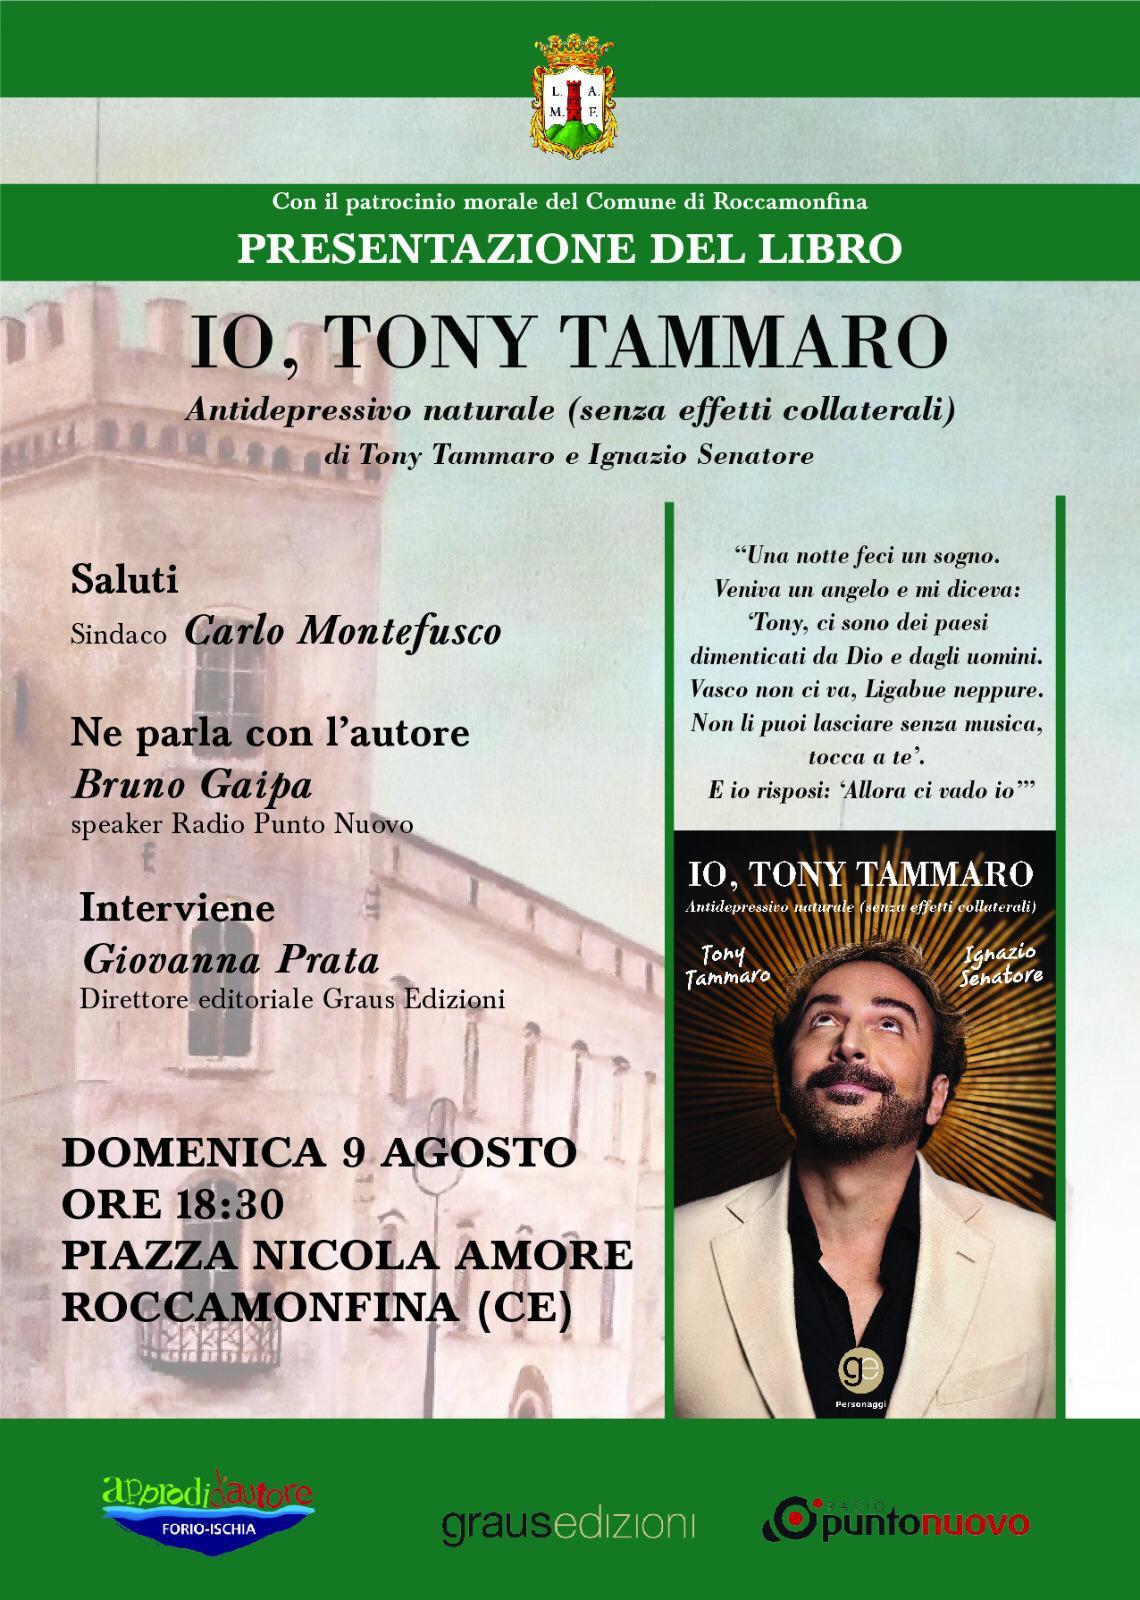 tony-tammaro-a-roccamonfina